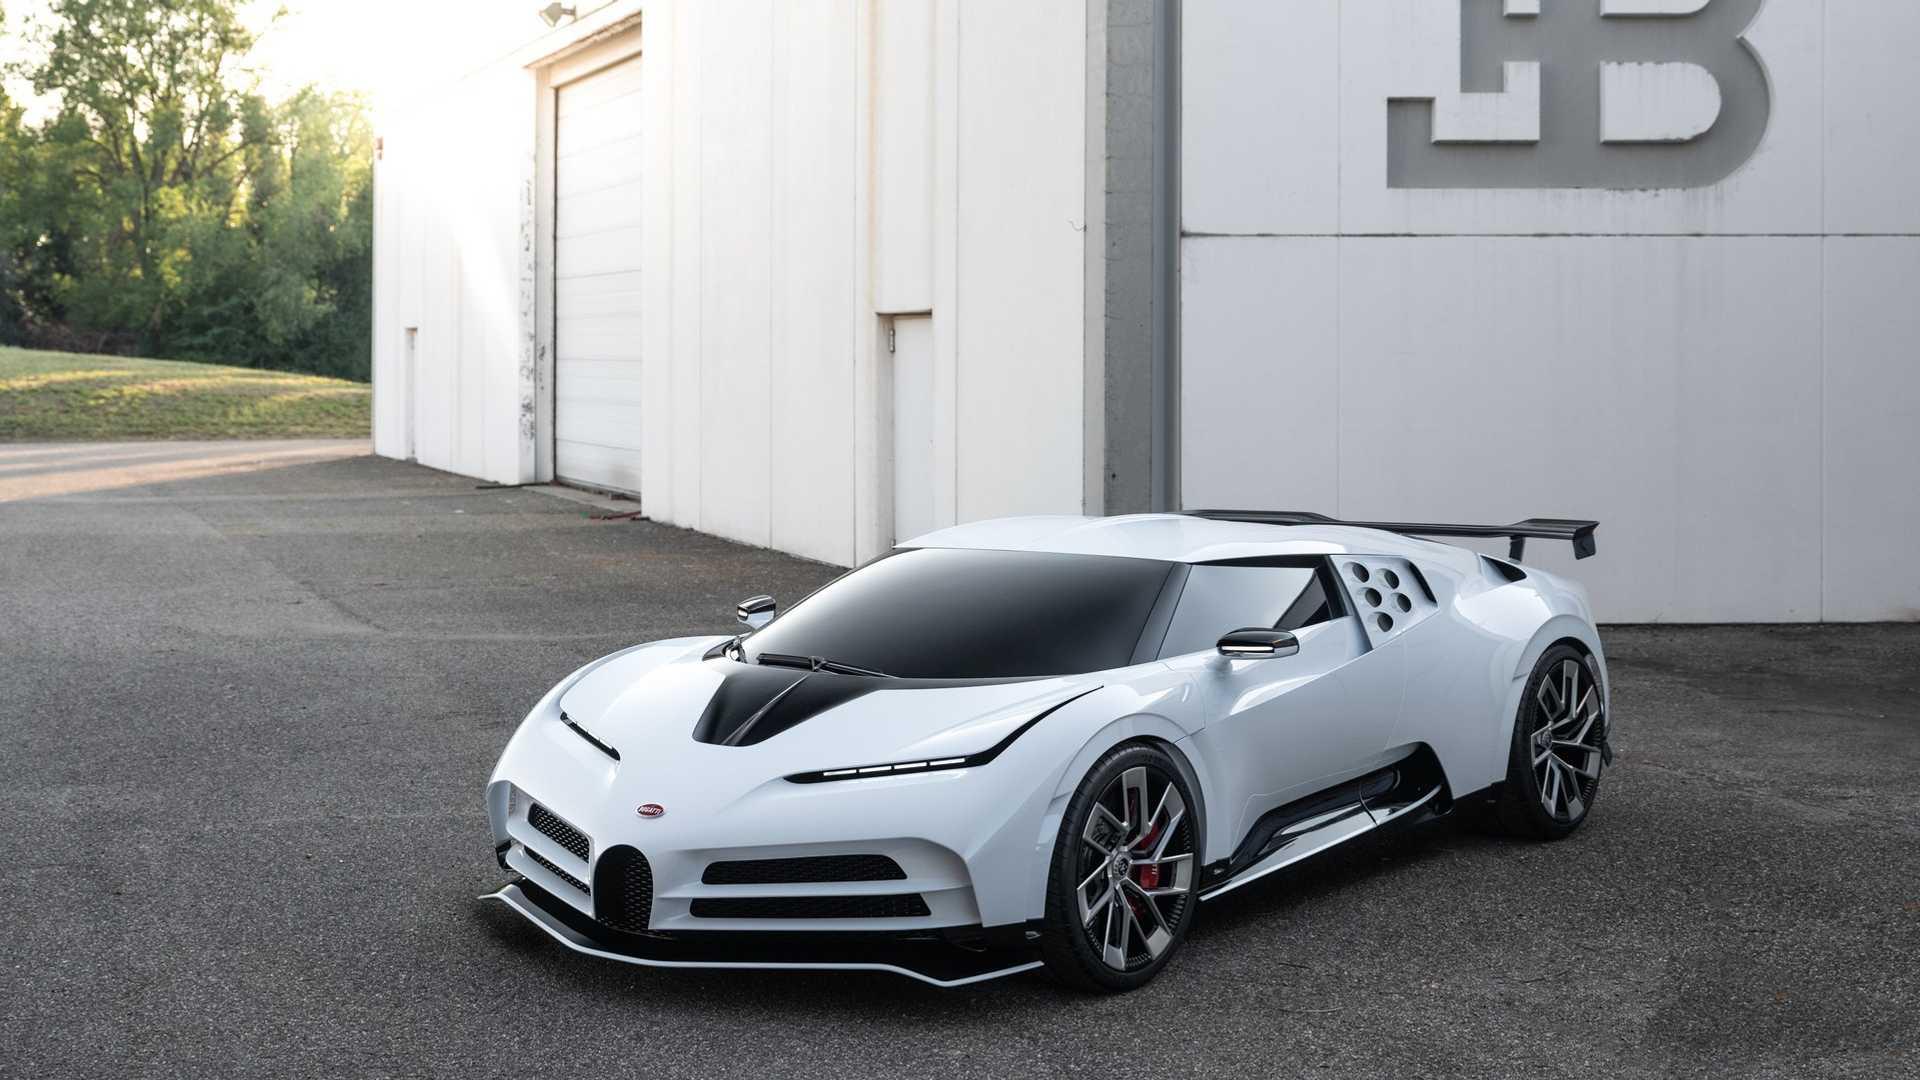 Фото: Bugatti